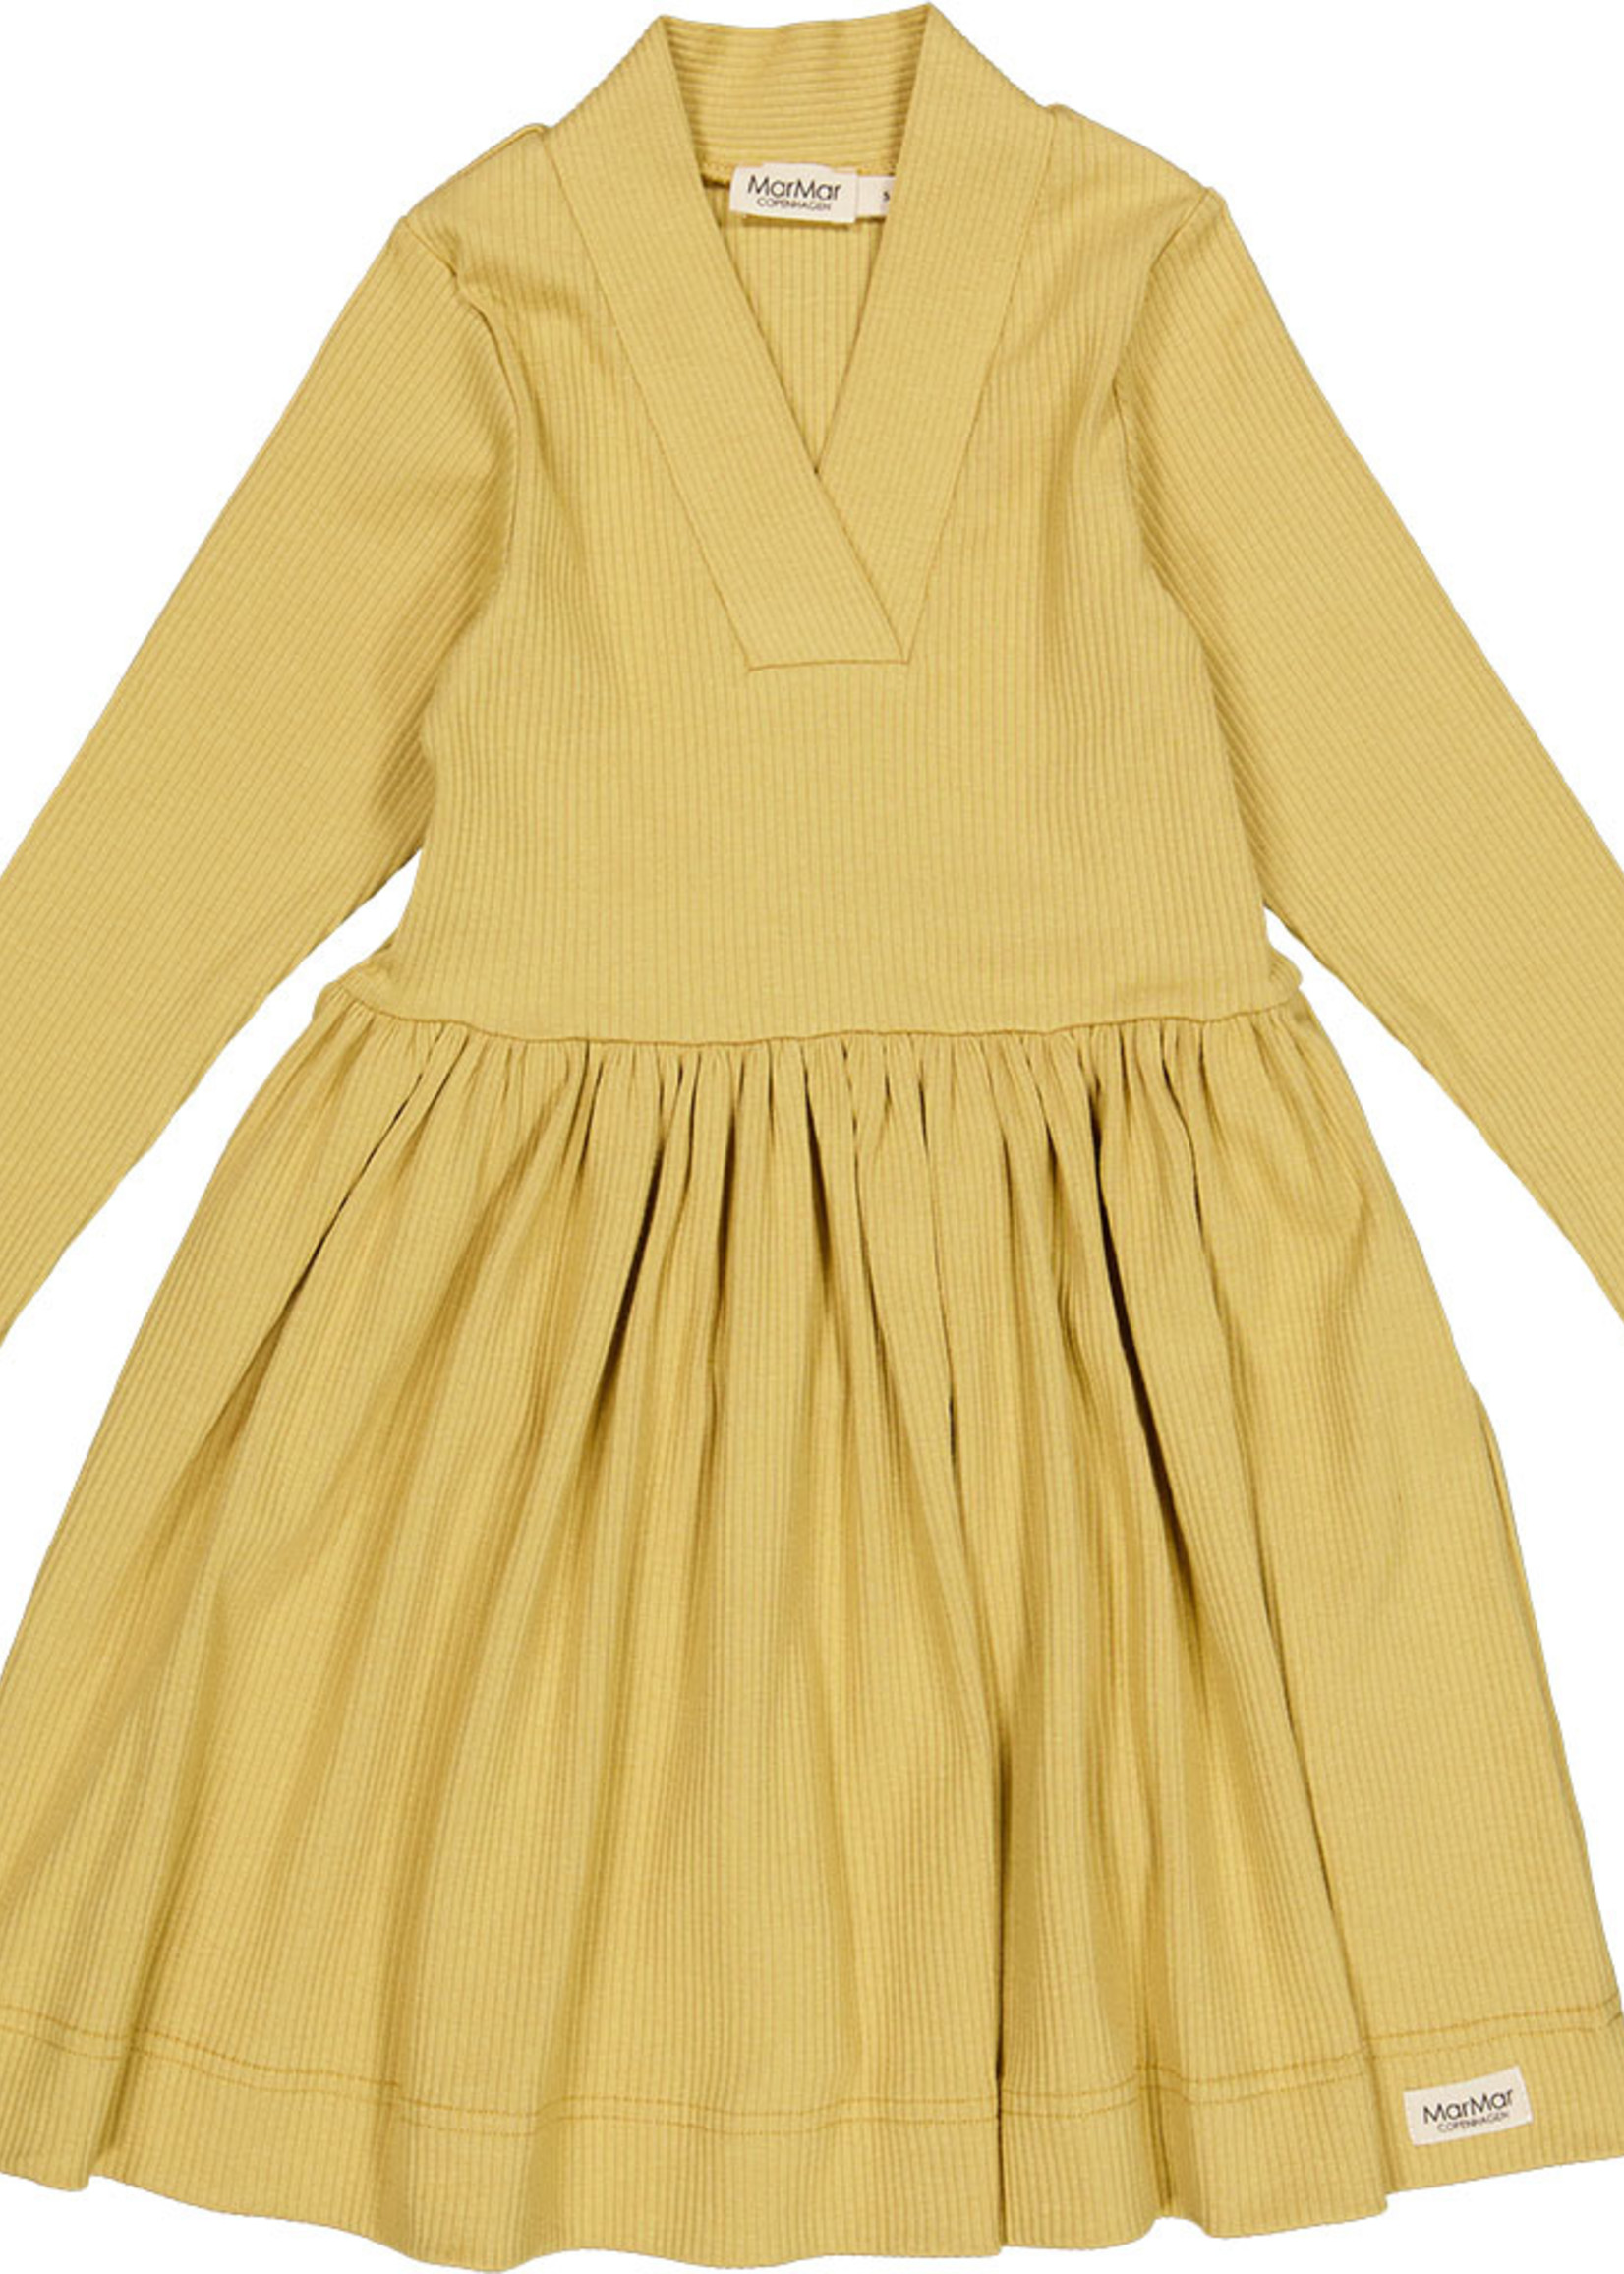 MarMar MarMar - Dress - Hay